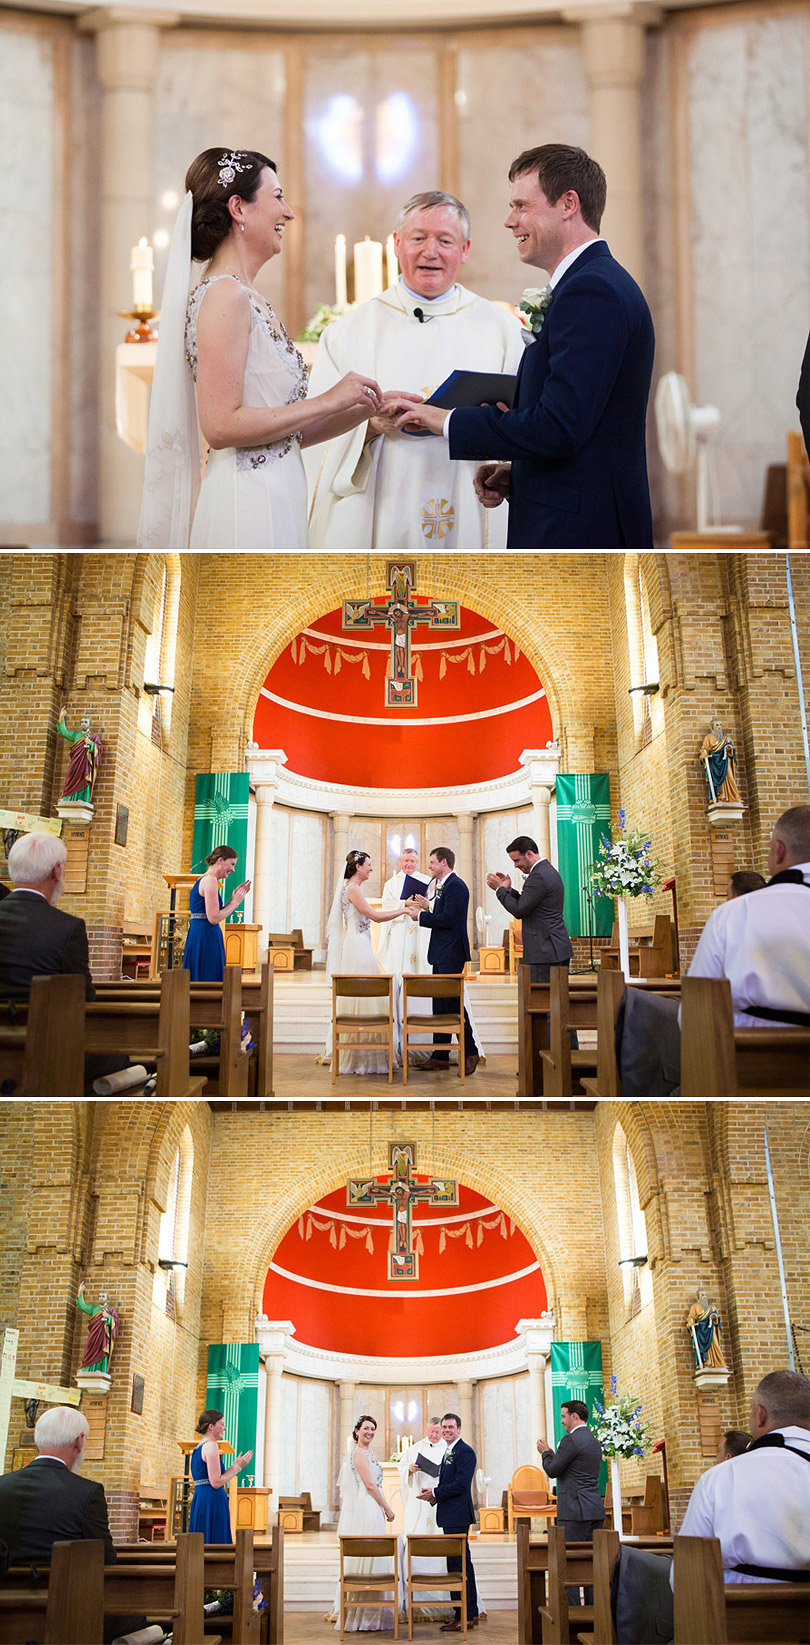 Oatlands-Park-Hotel-Wedding_LilyandFrankPhotography_7.jpg